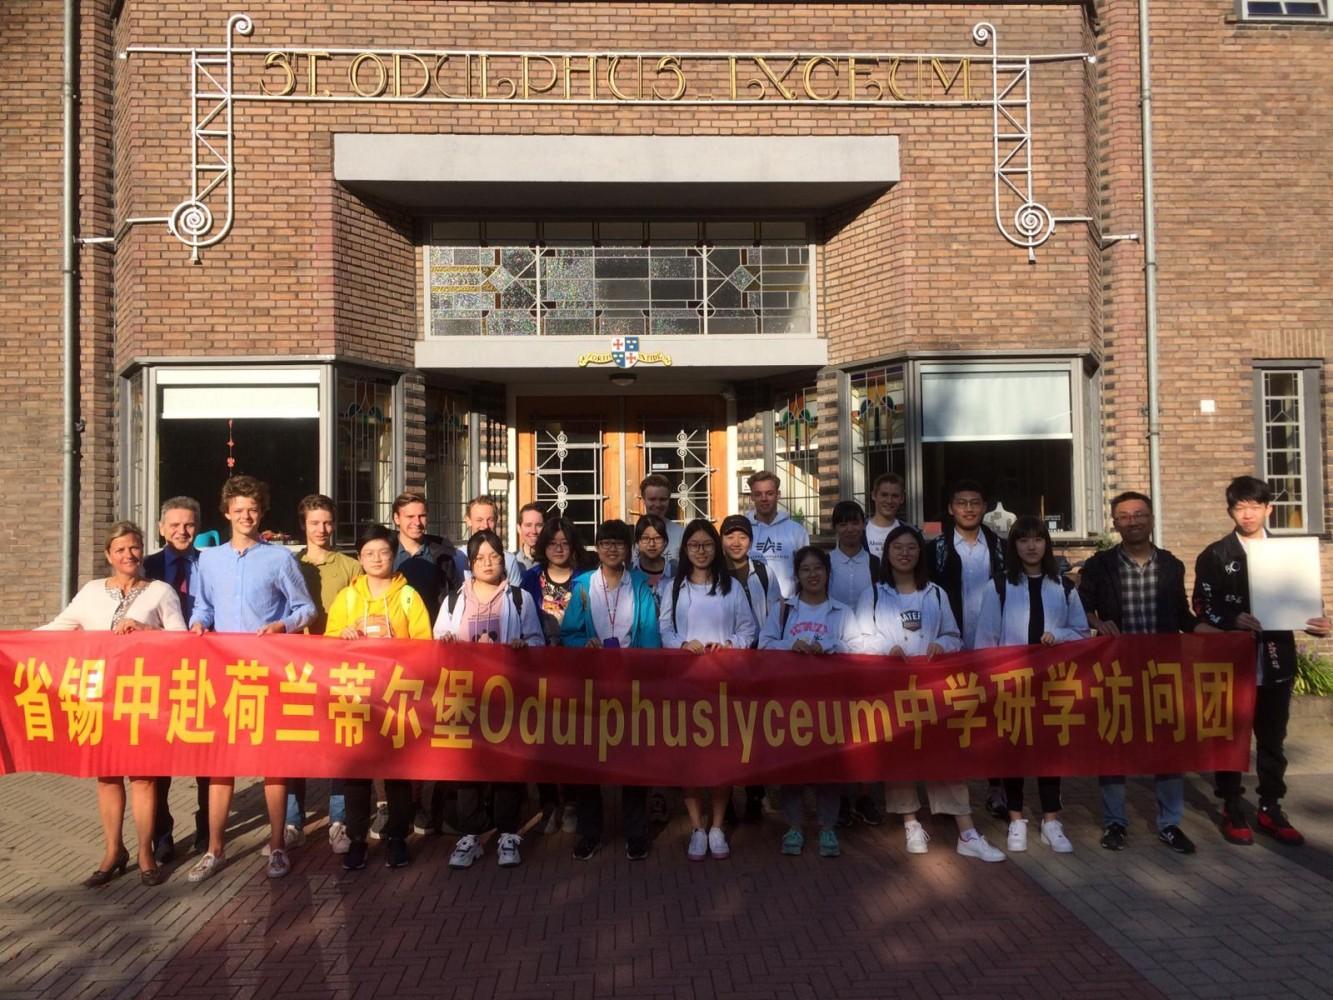 Bezoek uit China